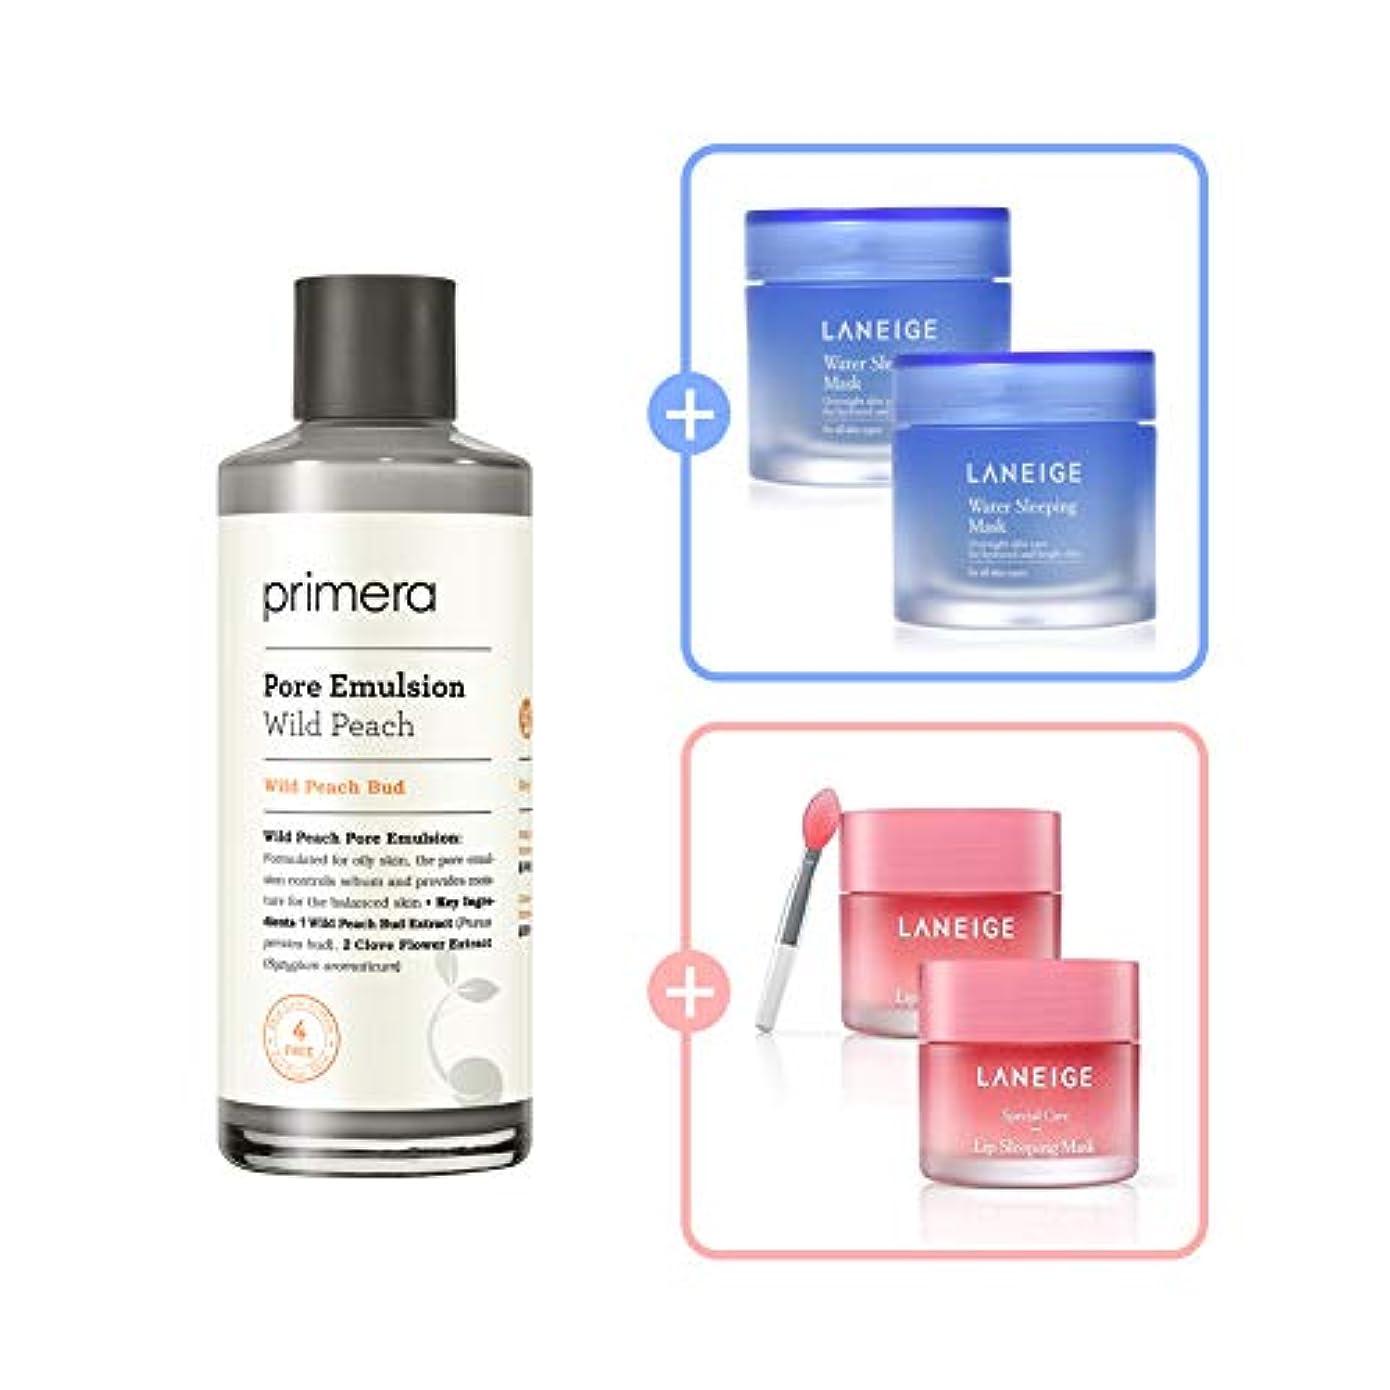 【primera公式】プリメラ ワイルド ピーチ ポア エマルジョン 150ml/primera Wild Peach Pore Emulsion 150ml